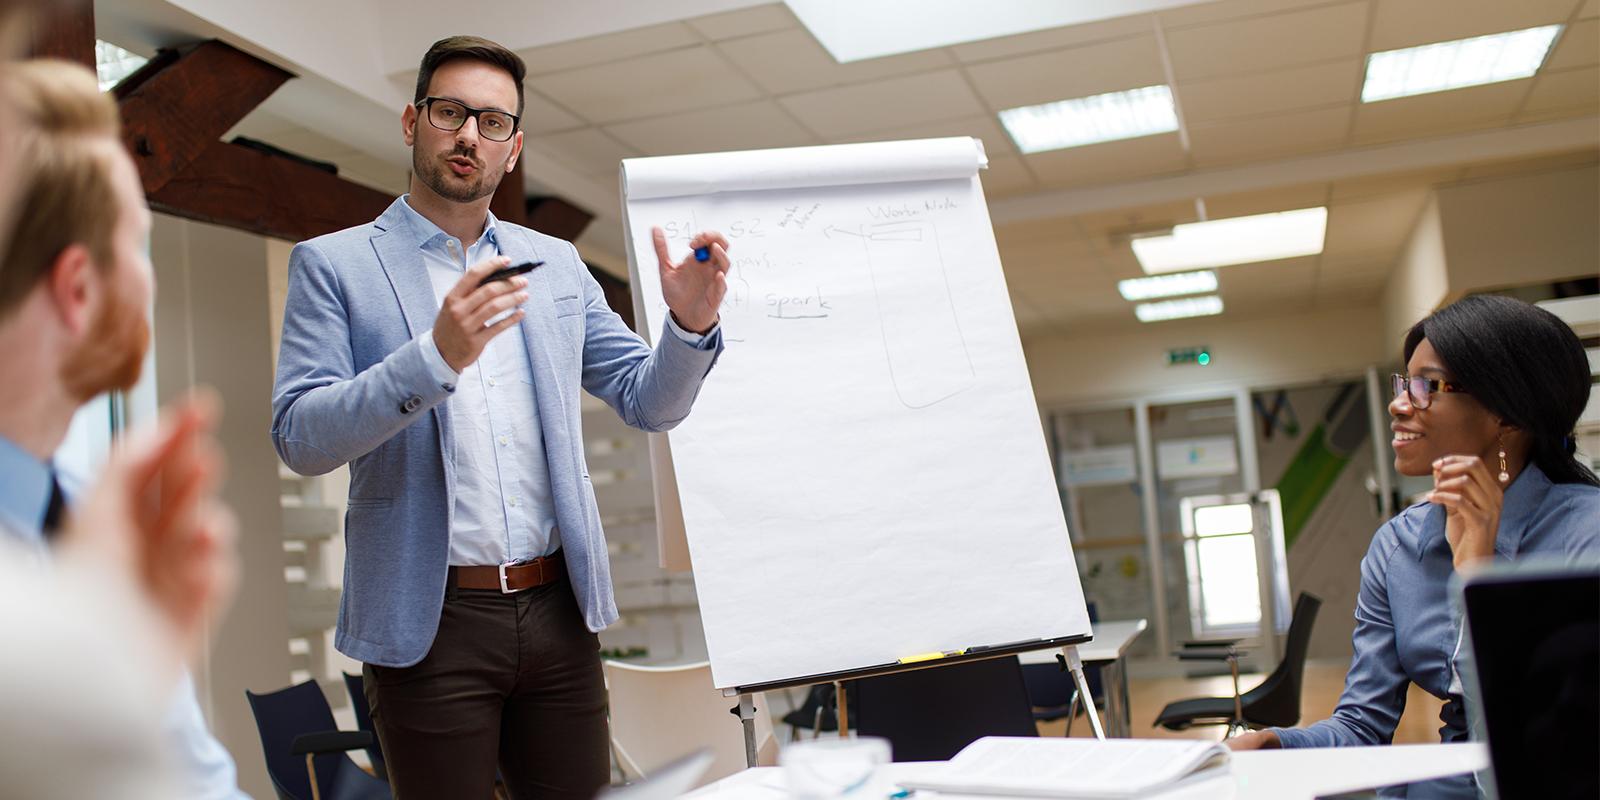 HubSpot sales tools that convert leads into revenue